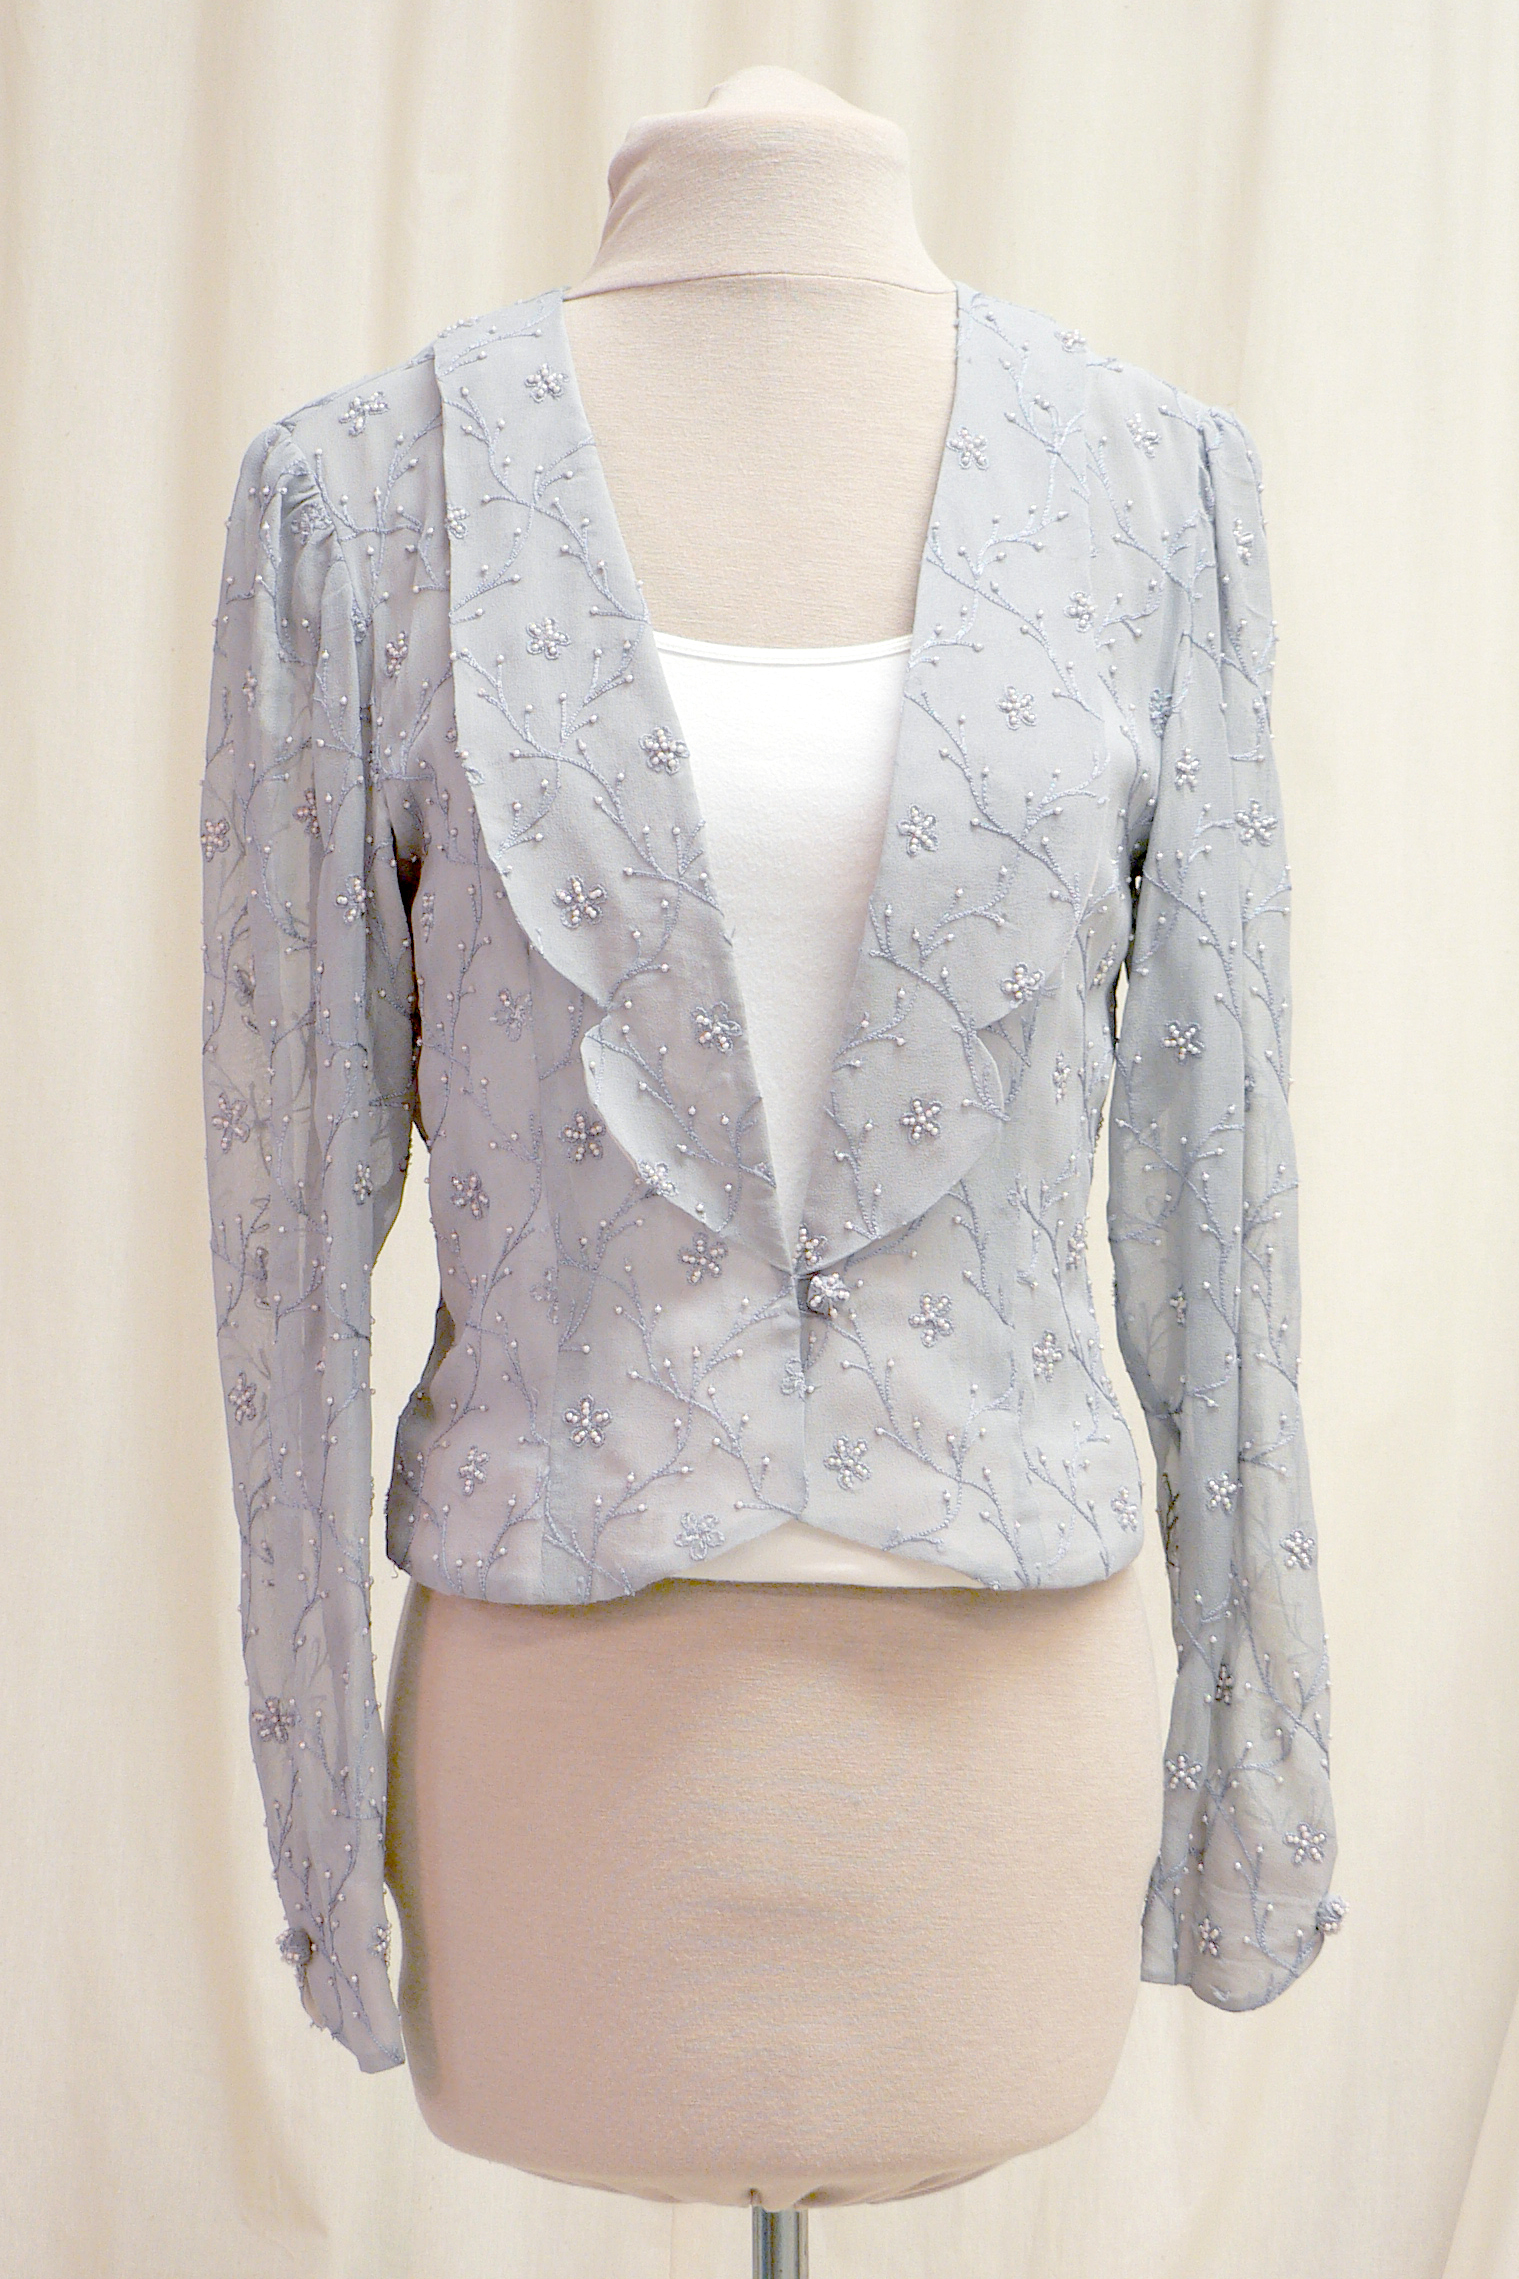 jacket08_front.jpg